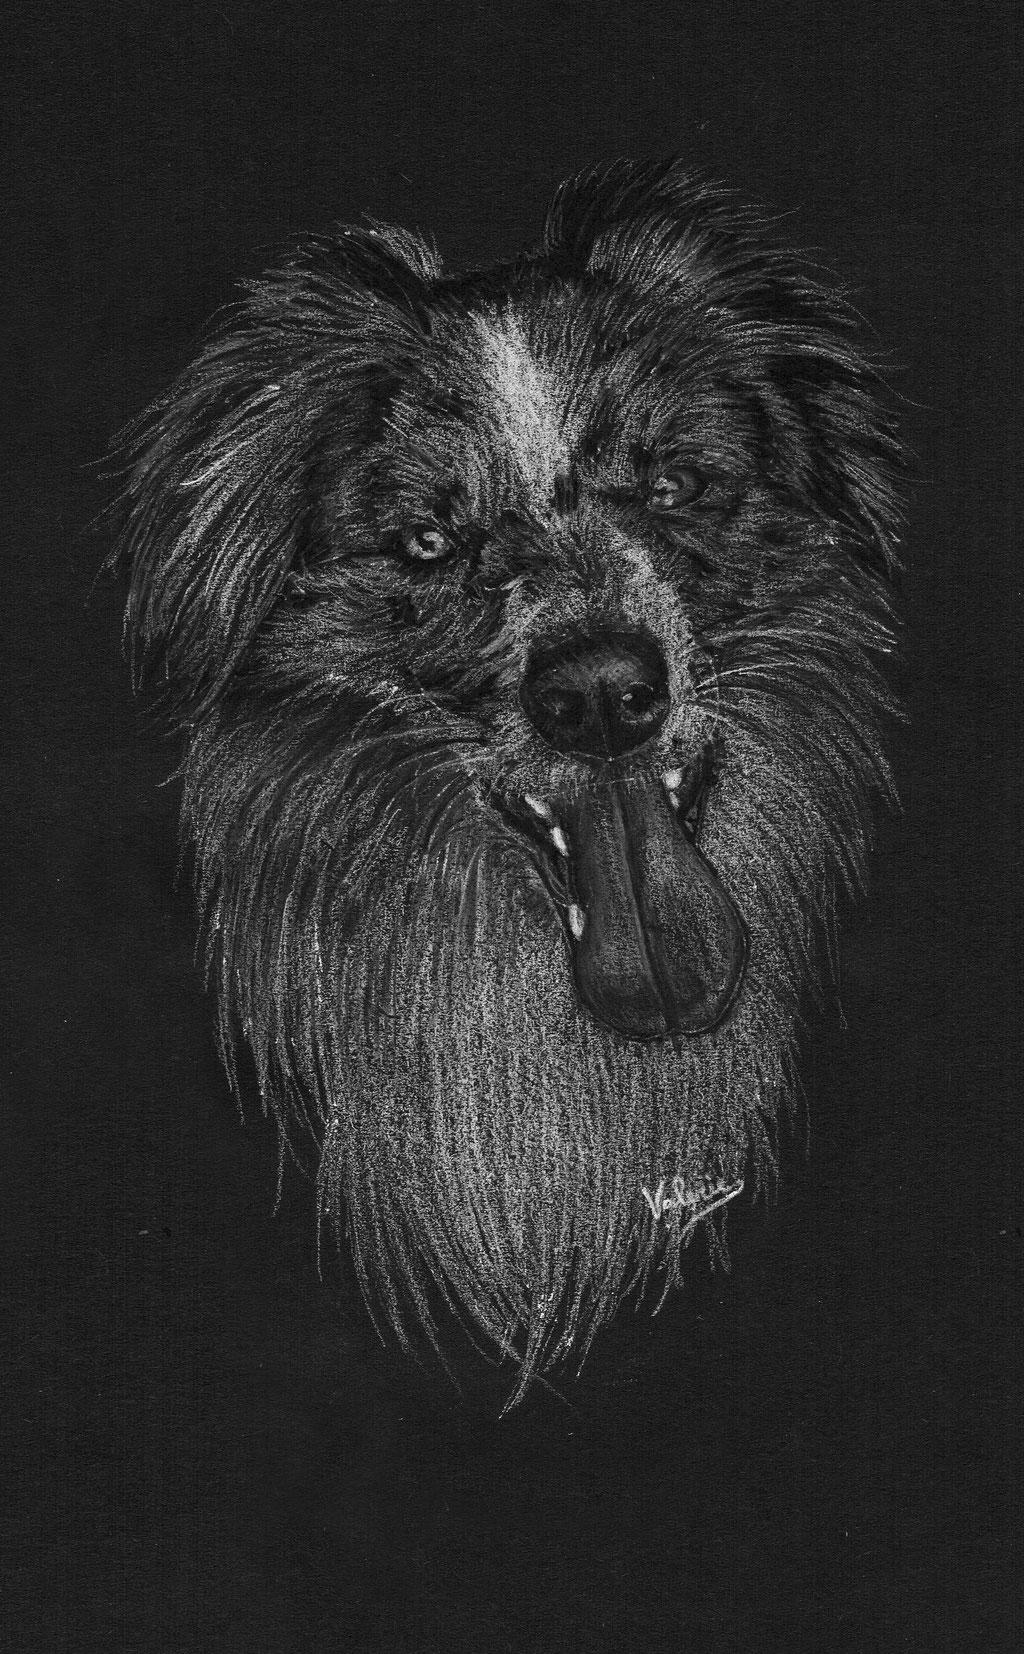 Dierenportret border collie: Wit potlood en houtskool op zwart papier (2017)